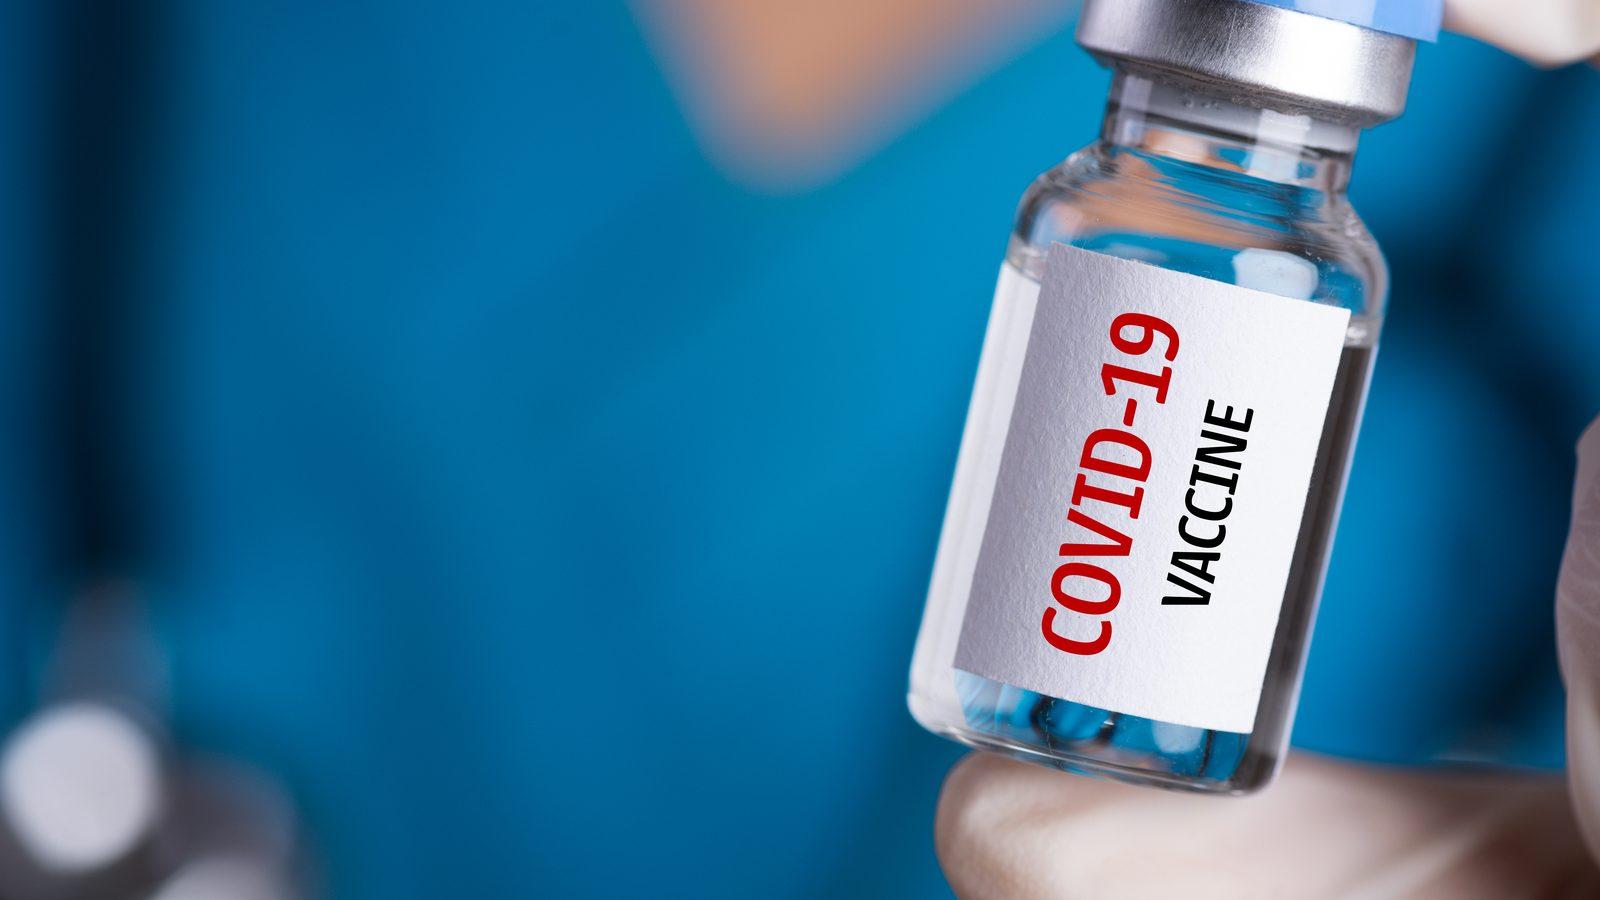 sindh obligates vaccination